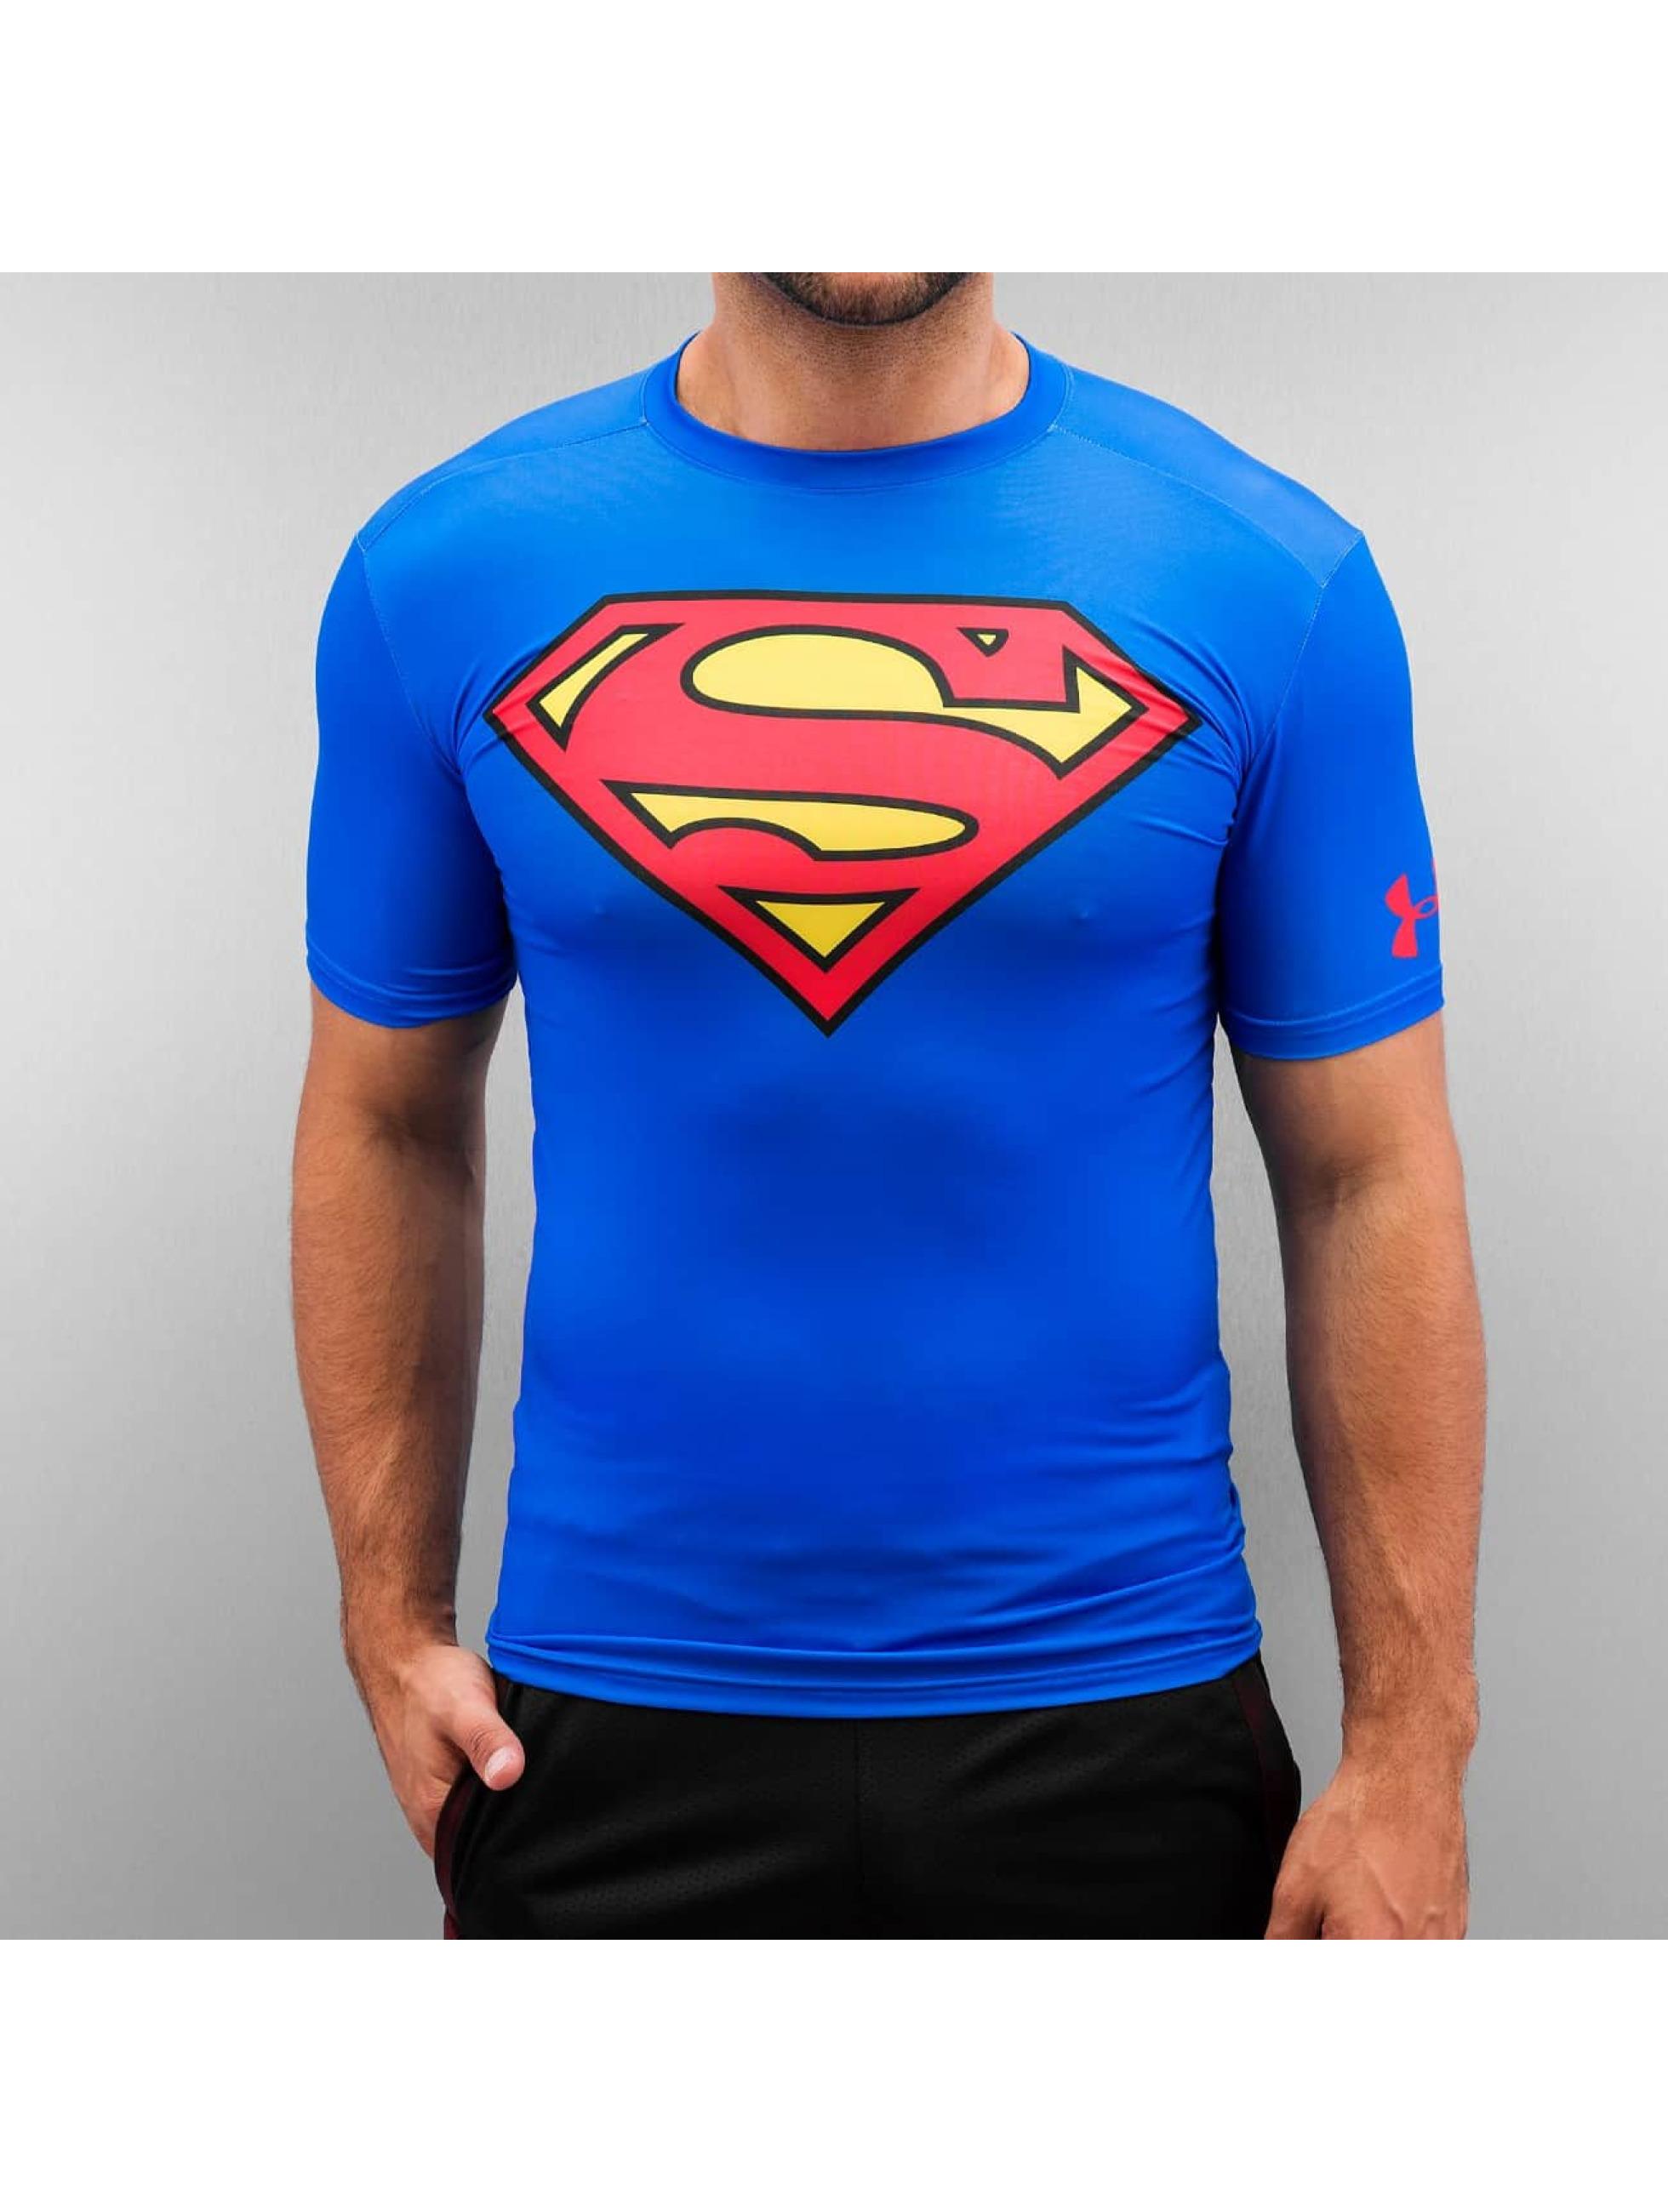 Under Armour Футболка Alter Ego Superman Compression синий